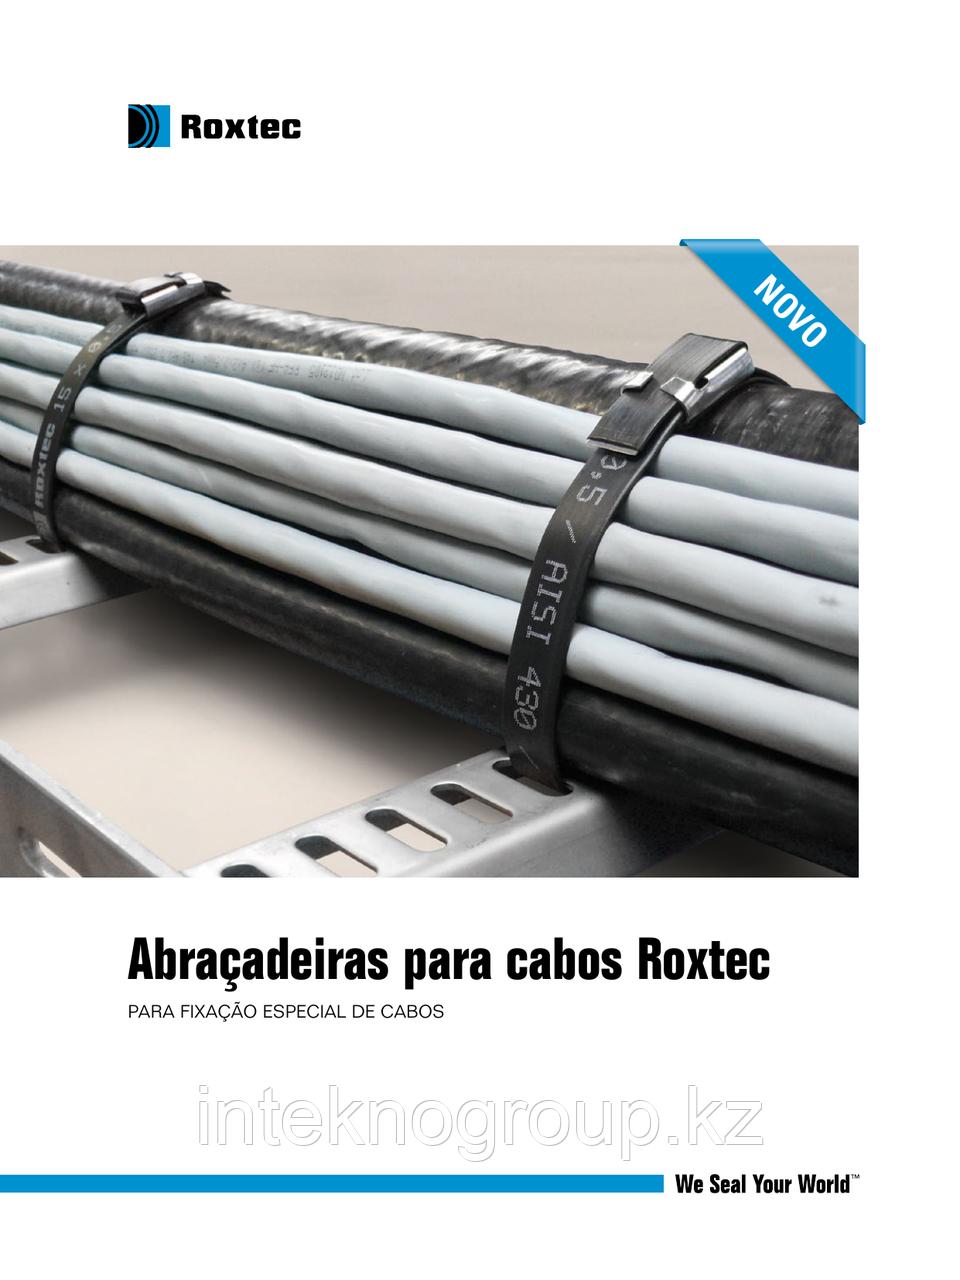 Roxtec Cable straps Strap 15x0,5 grey/galv. L=500 mm